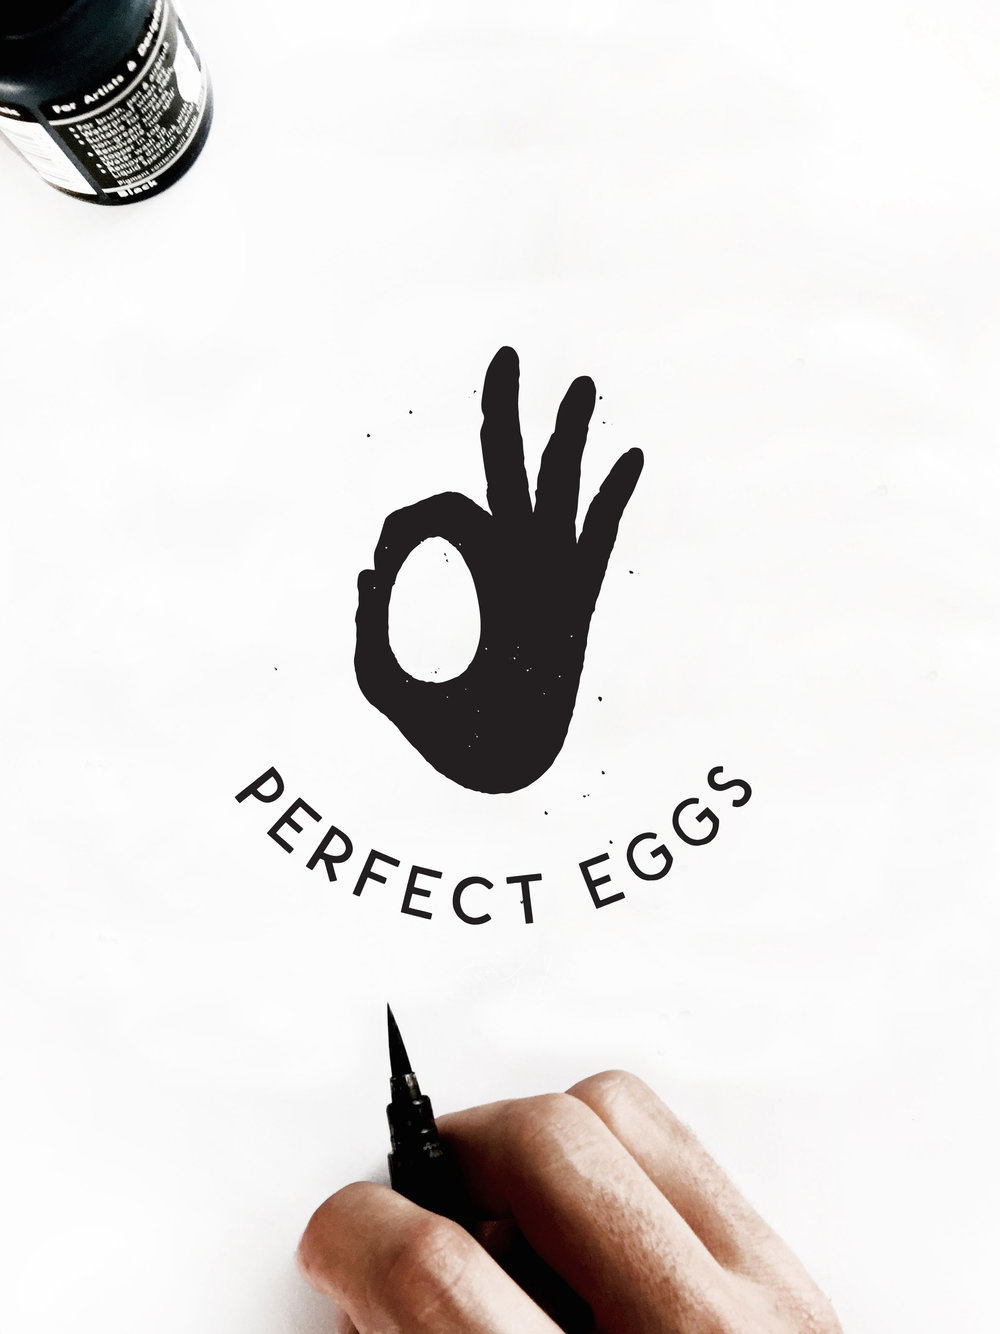 Perfect-Eggs 2.jpg